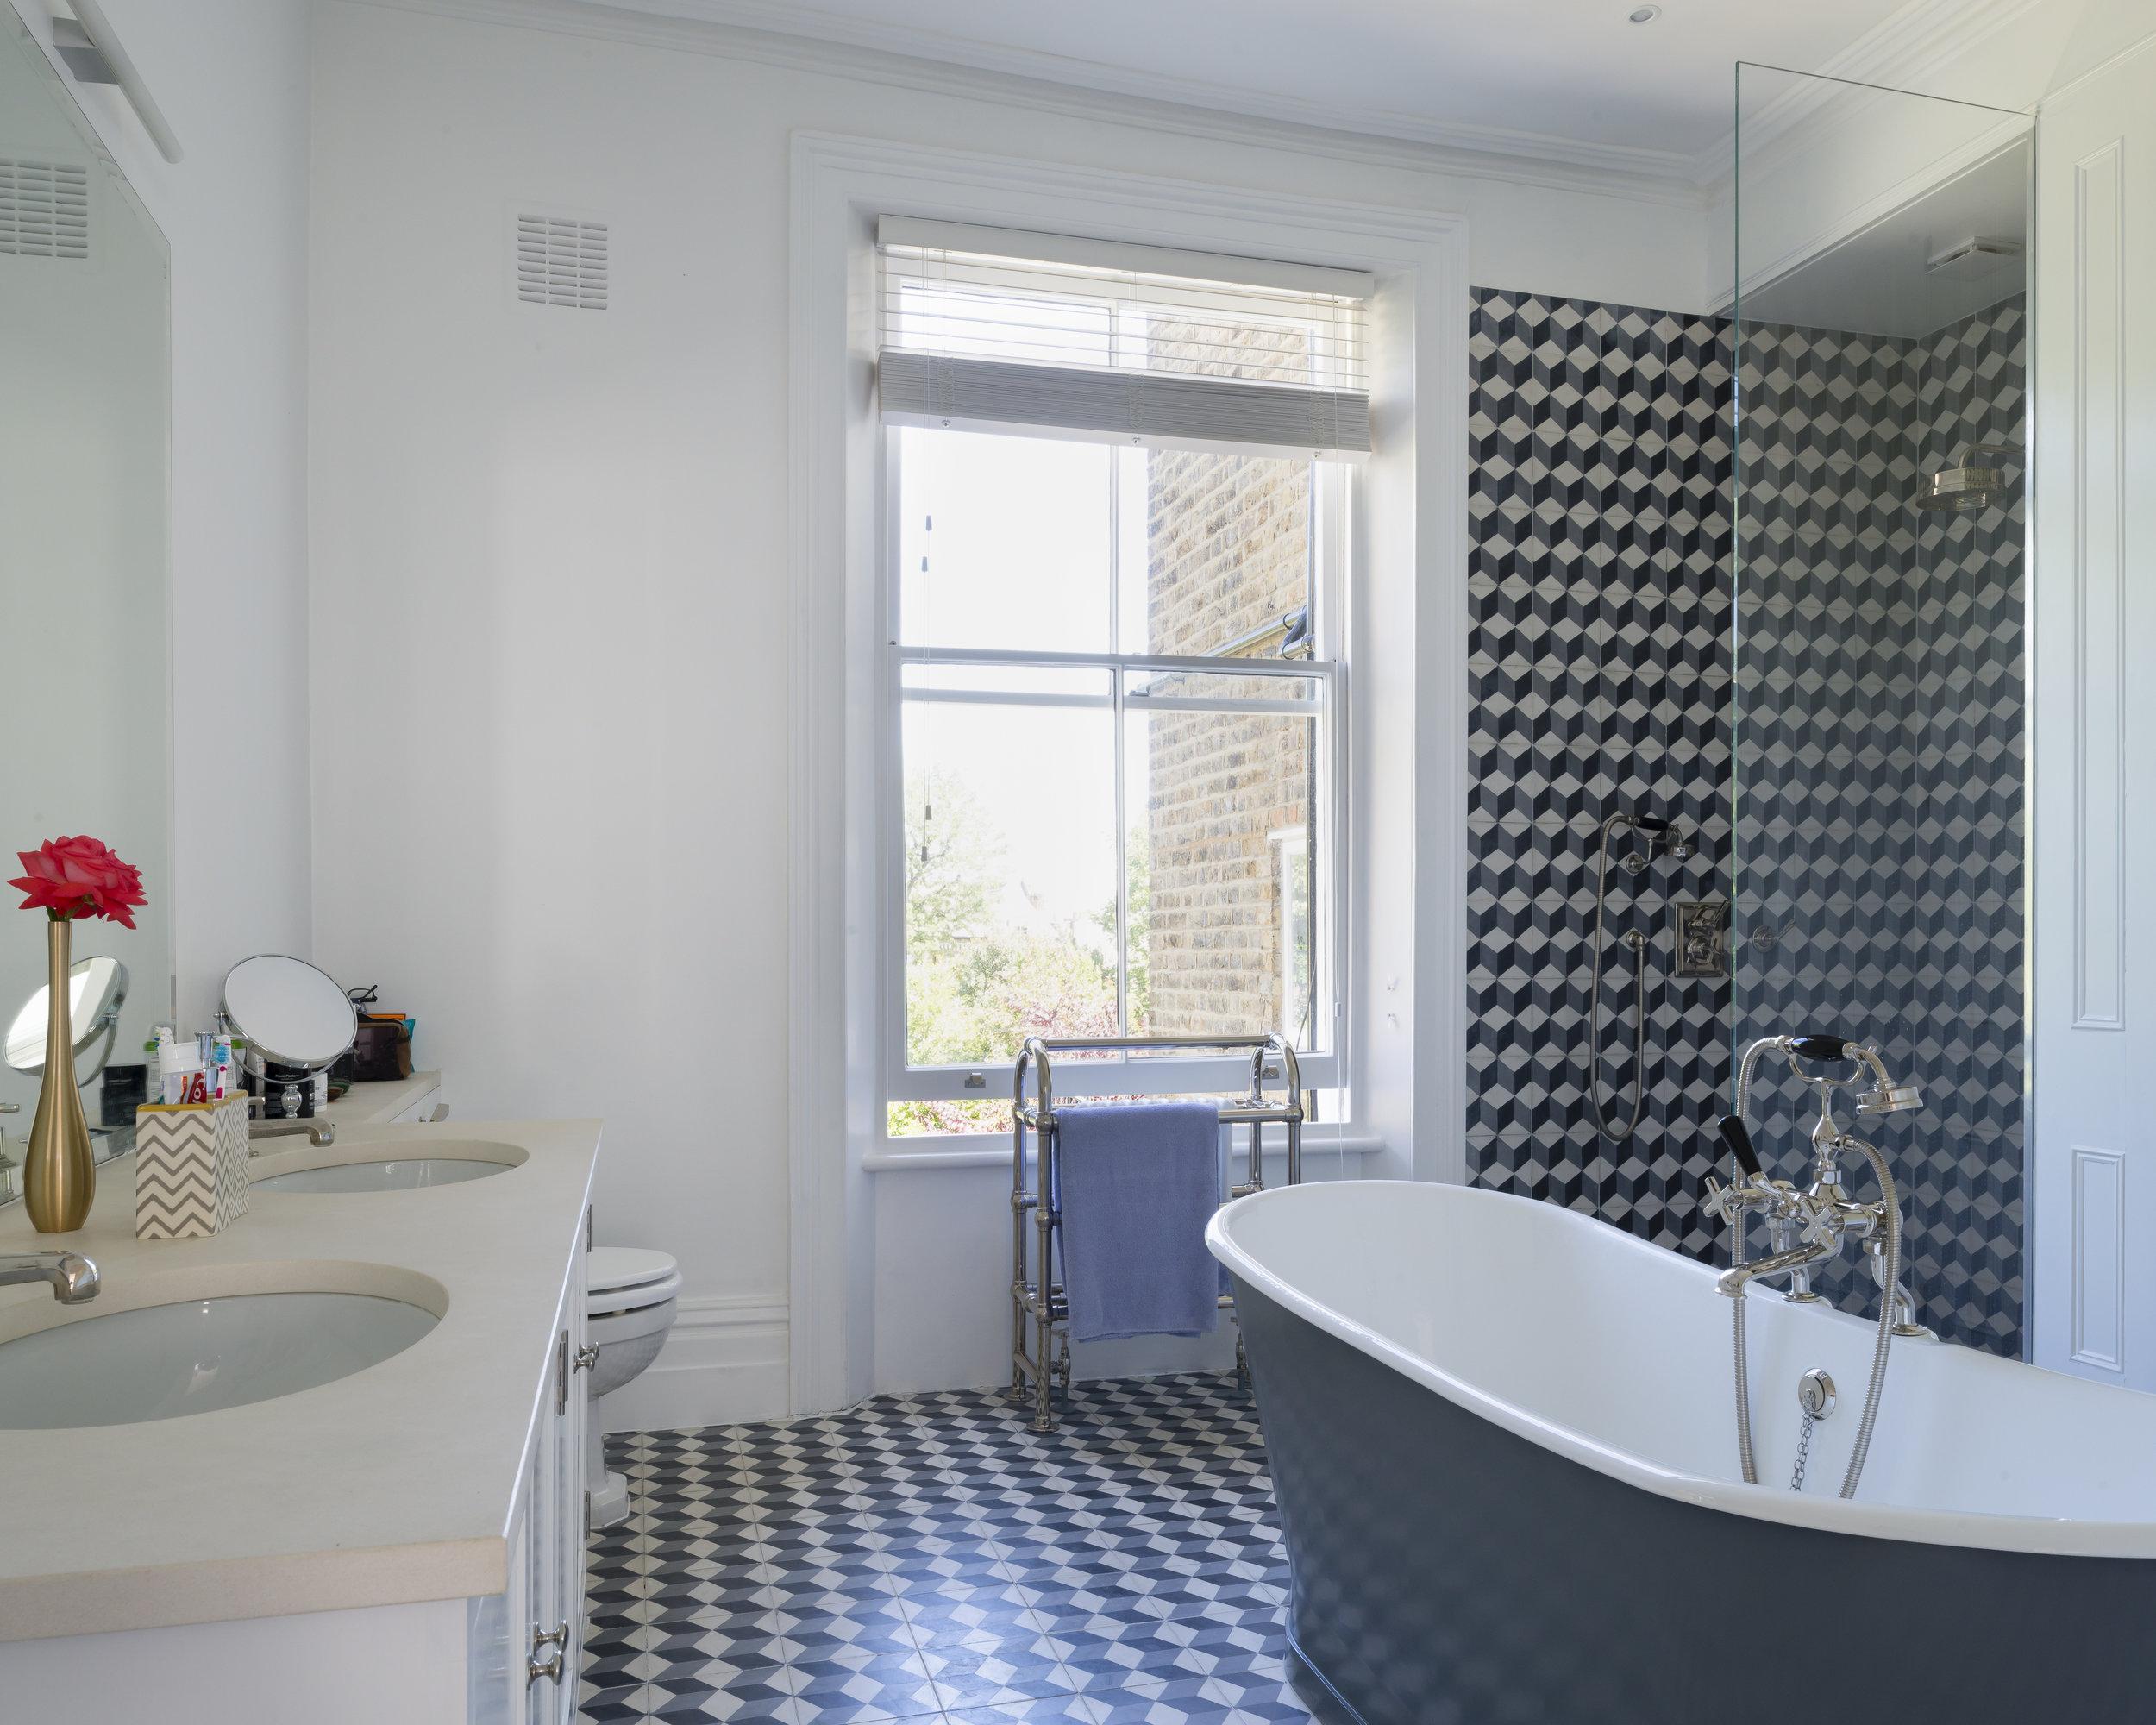 John Foat Architects - Architect Brighton - Clapham